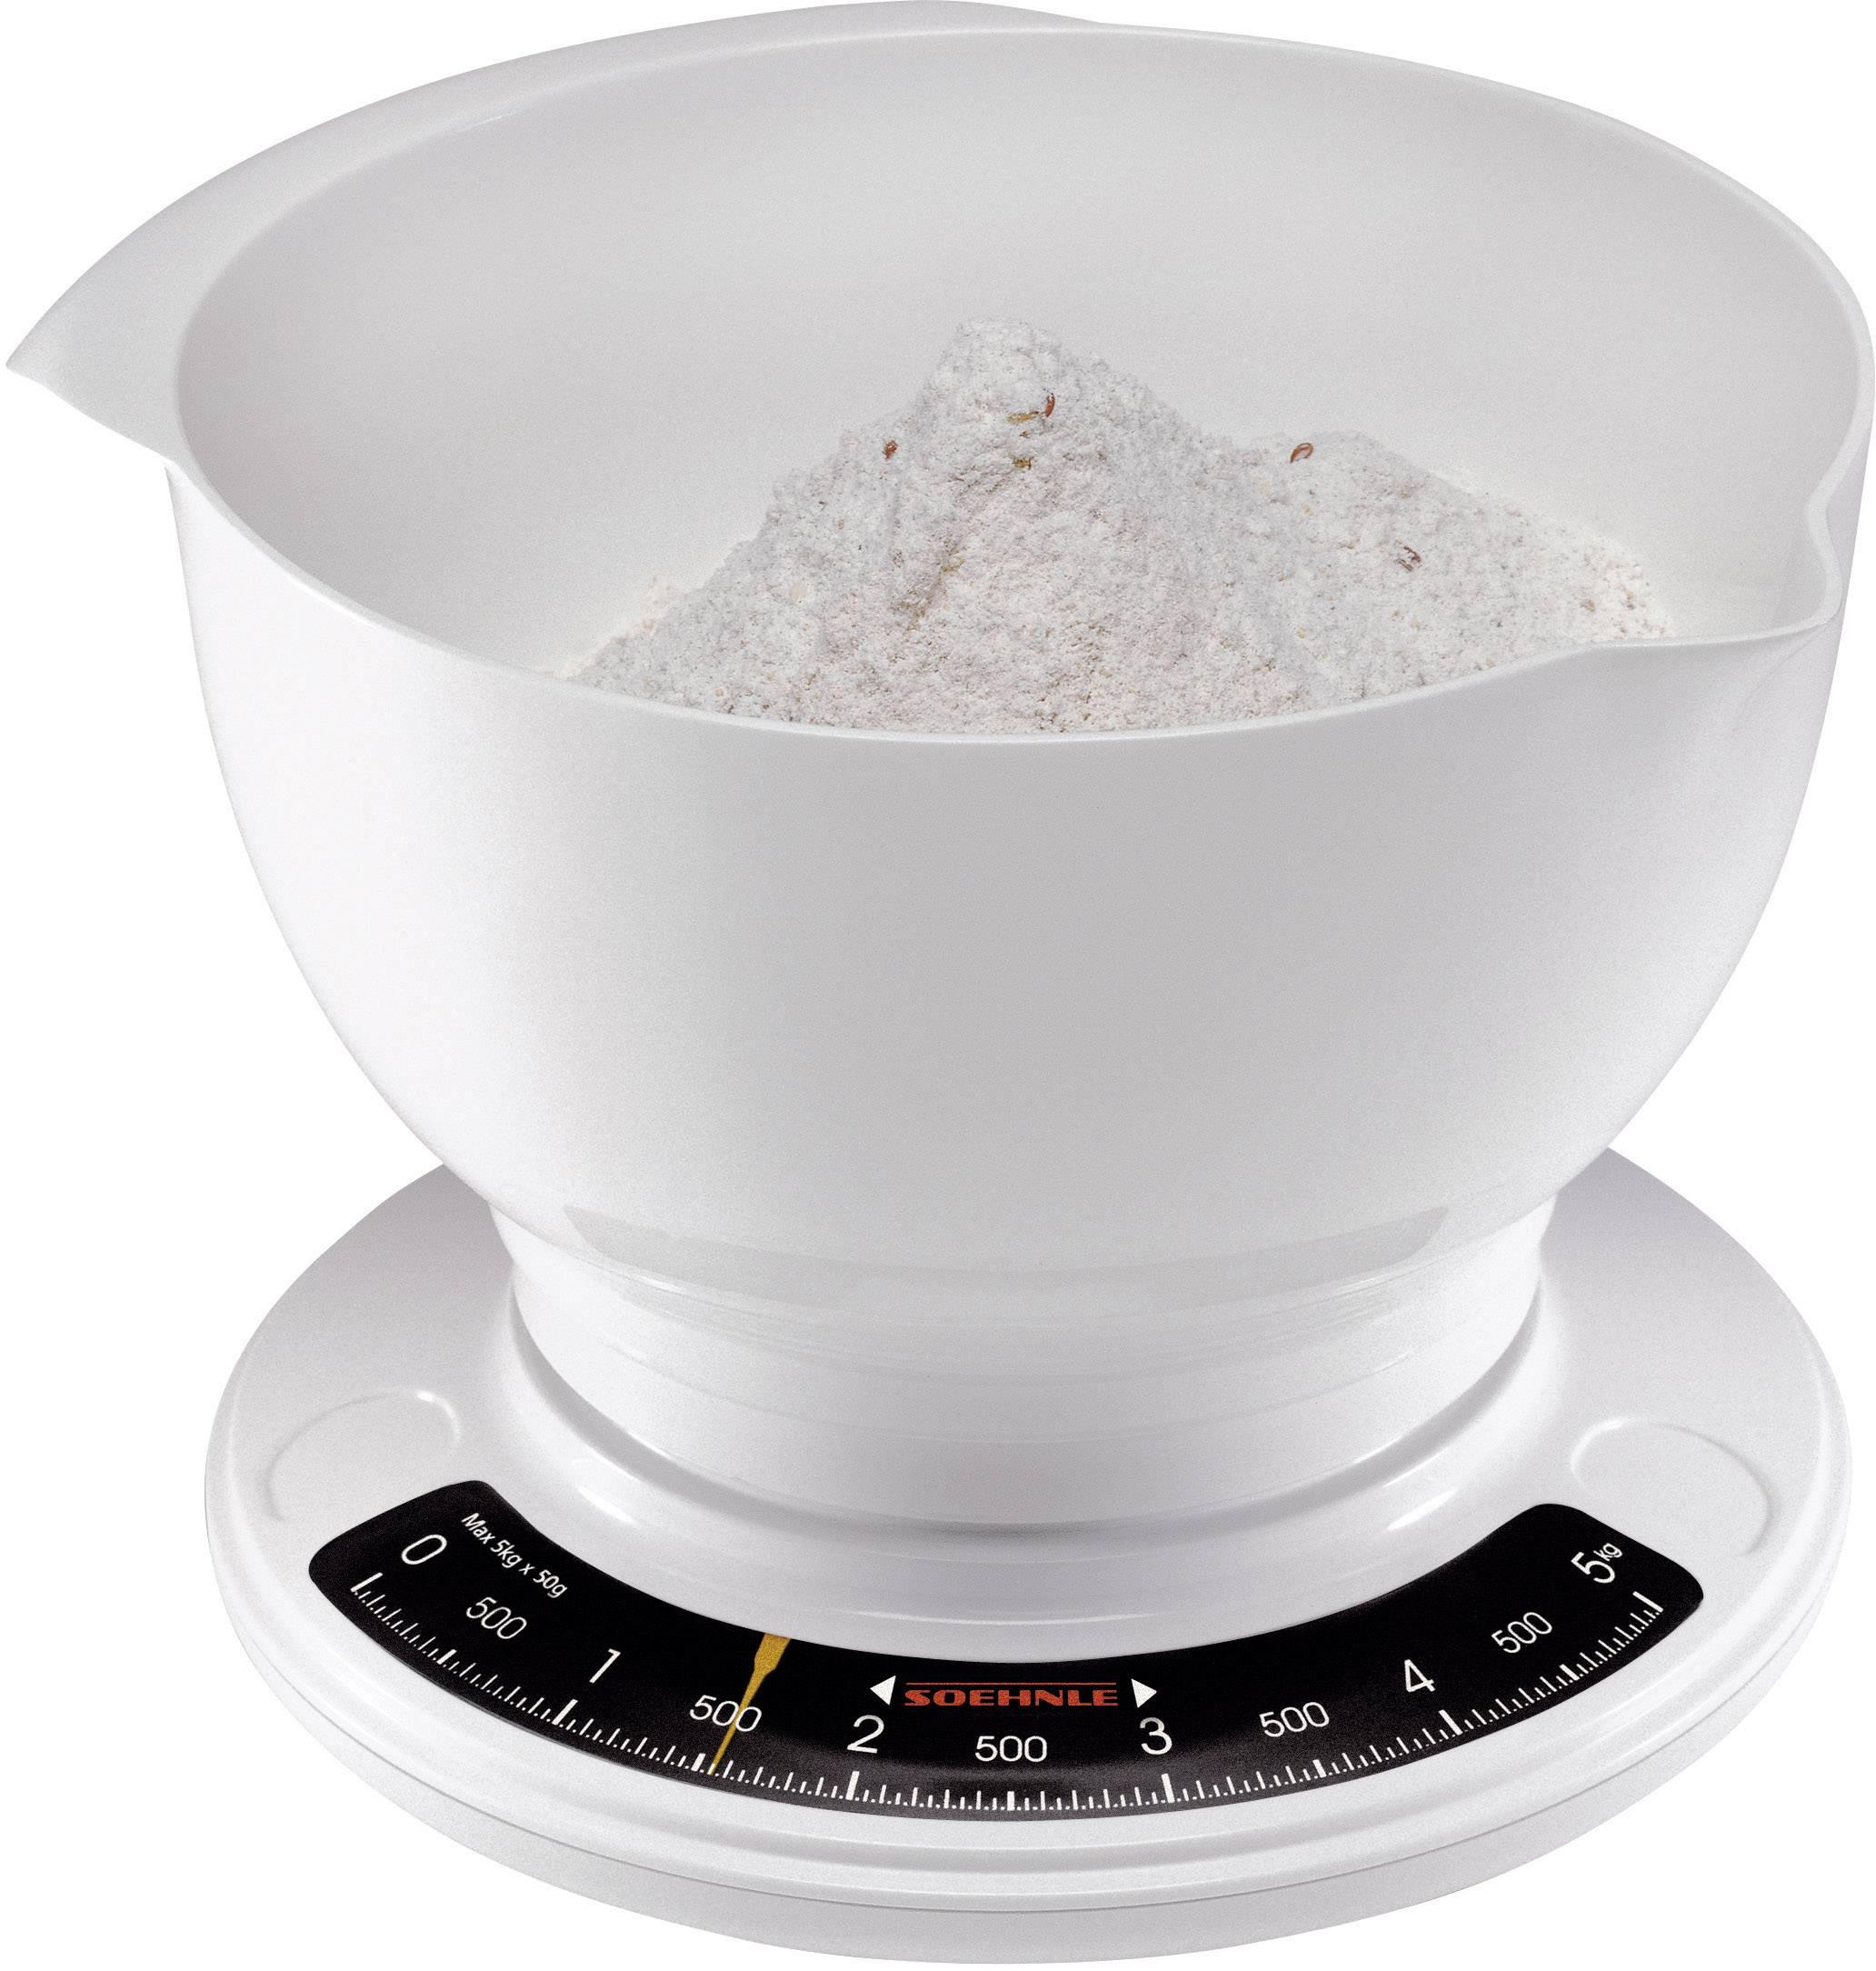 rührschüssel Analogique Balance Balance Soehnle Balance de cuisine Balance Culina Pro 65054 5 kg